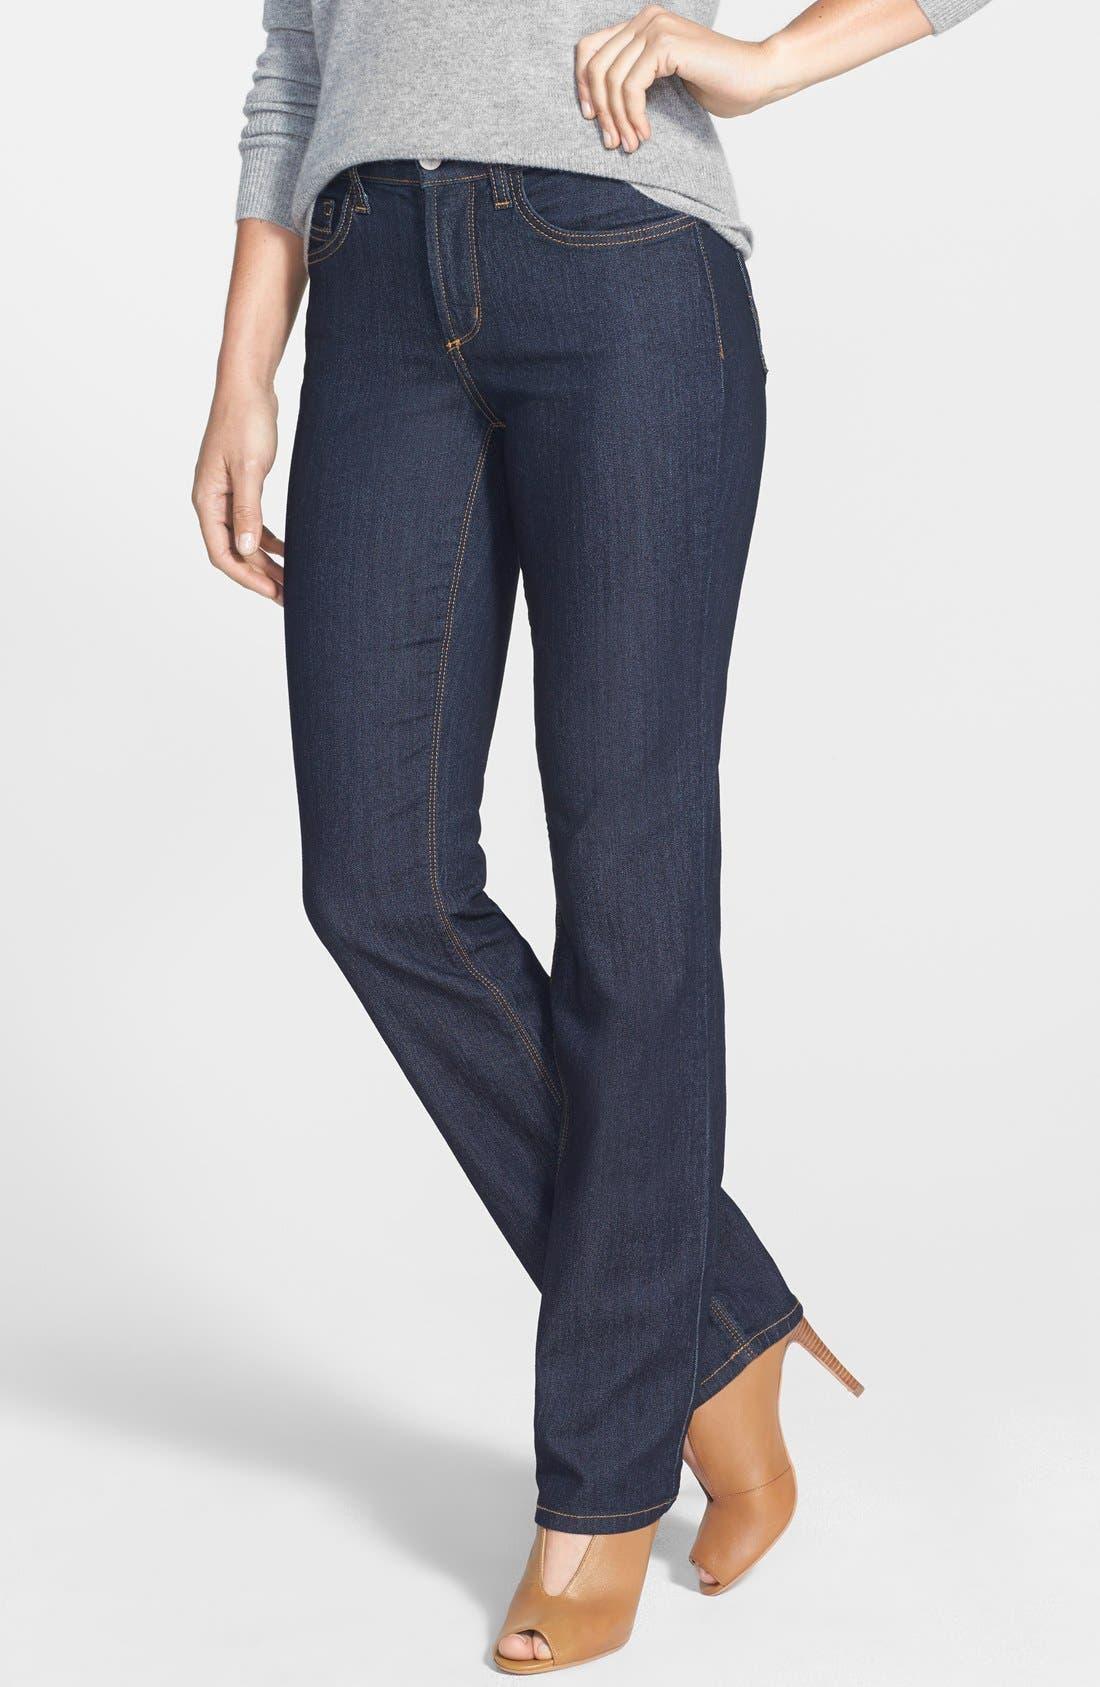 Main Image - NYDJ 'Marilyn' Stretch Straight Leg Jeans (Dark Enzyme) (Regular & Petite)